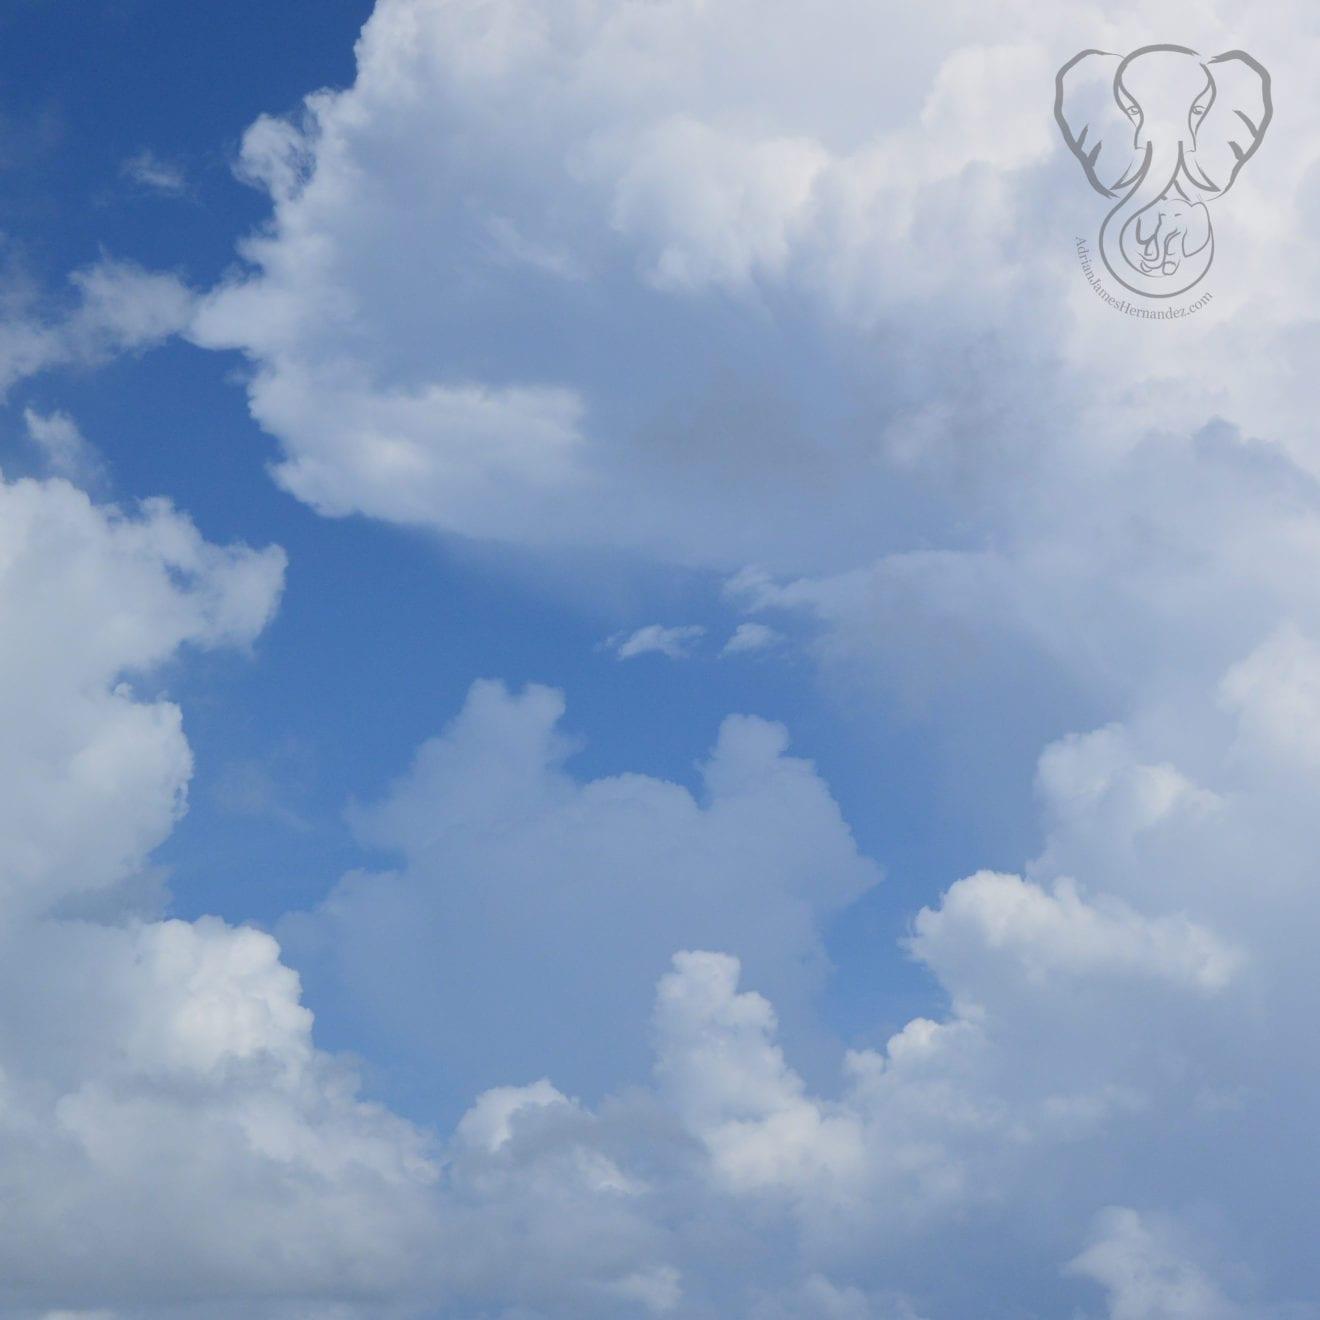 White fluffy clouds in a blue sky in Florida